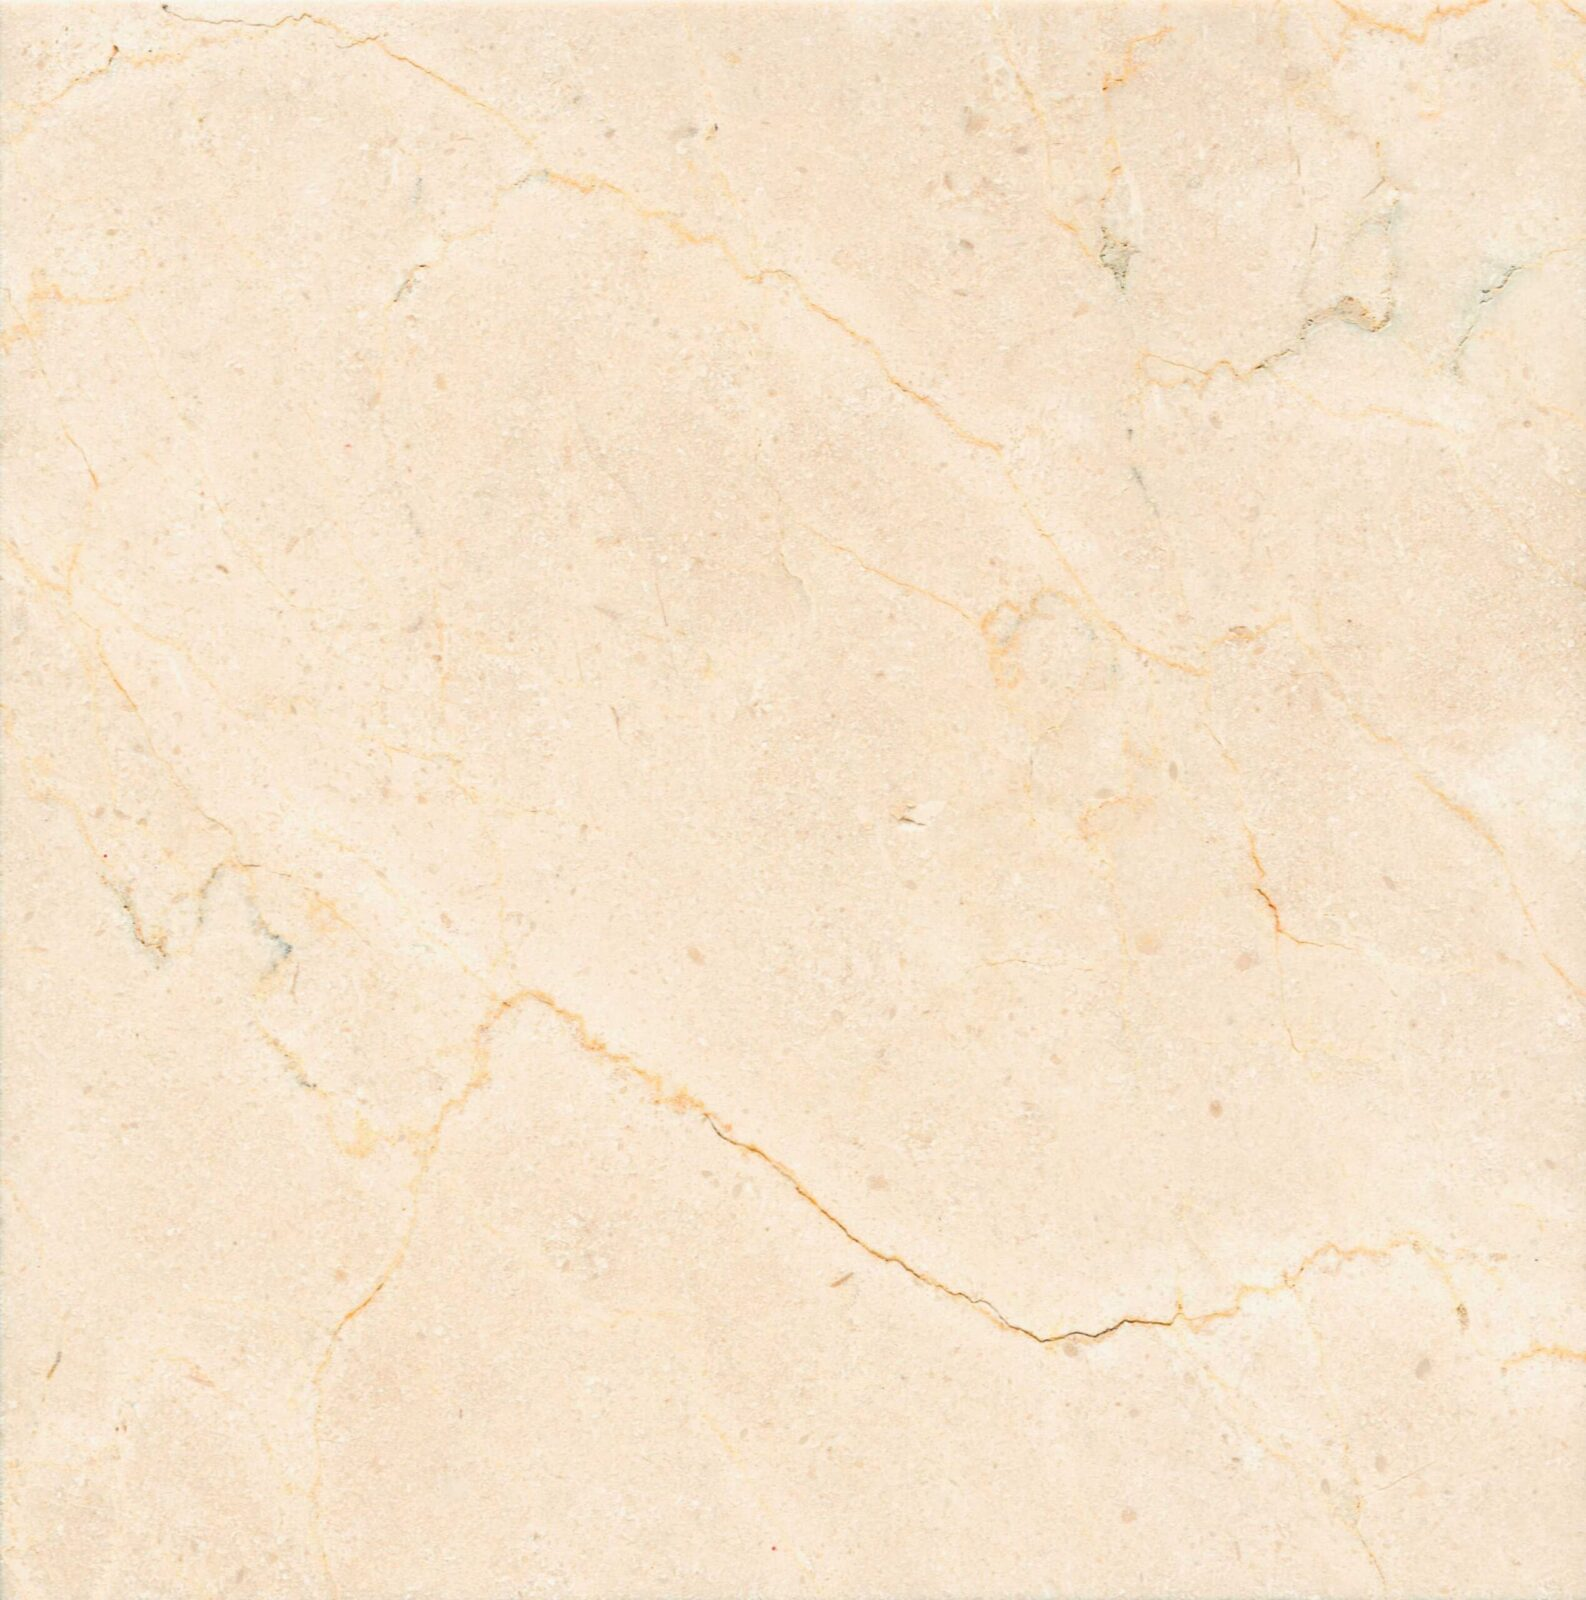 Crema marfil текстура 2